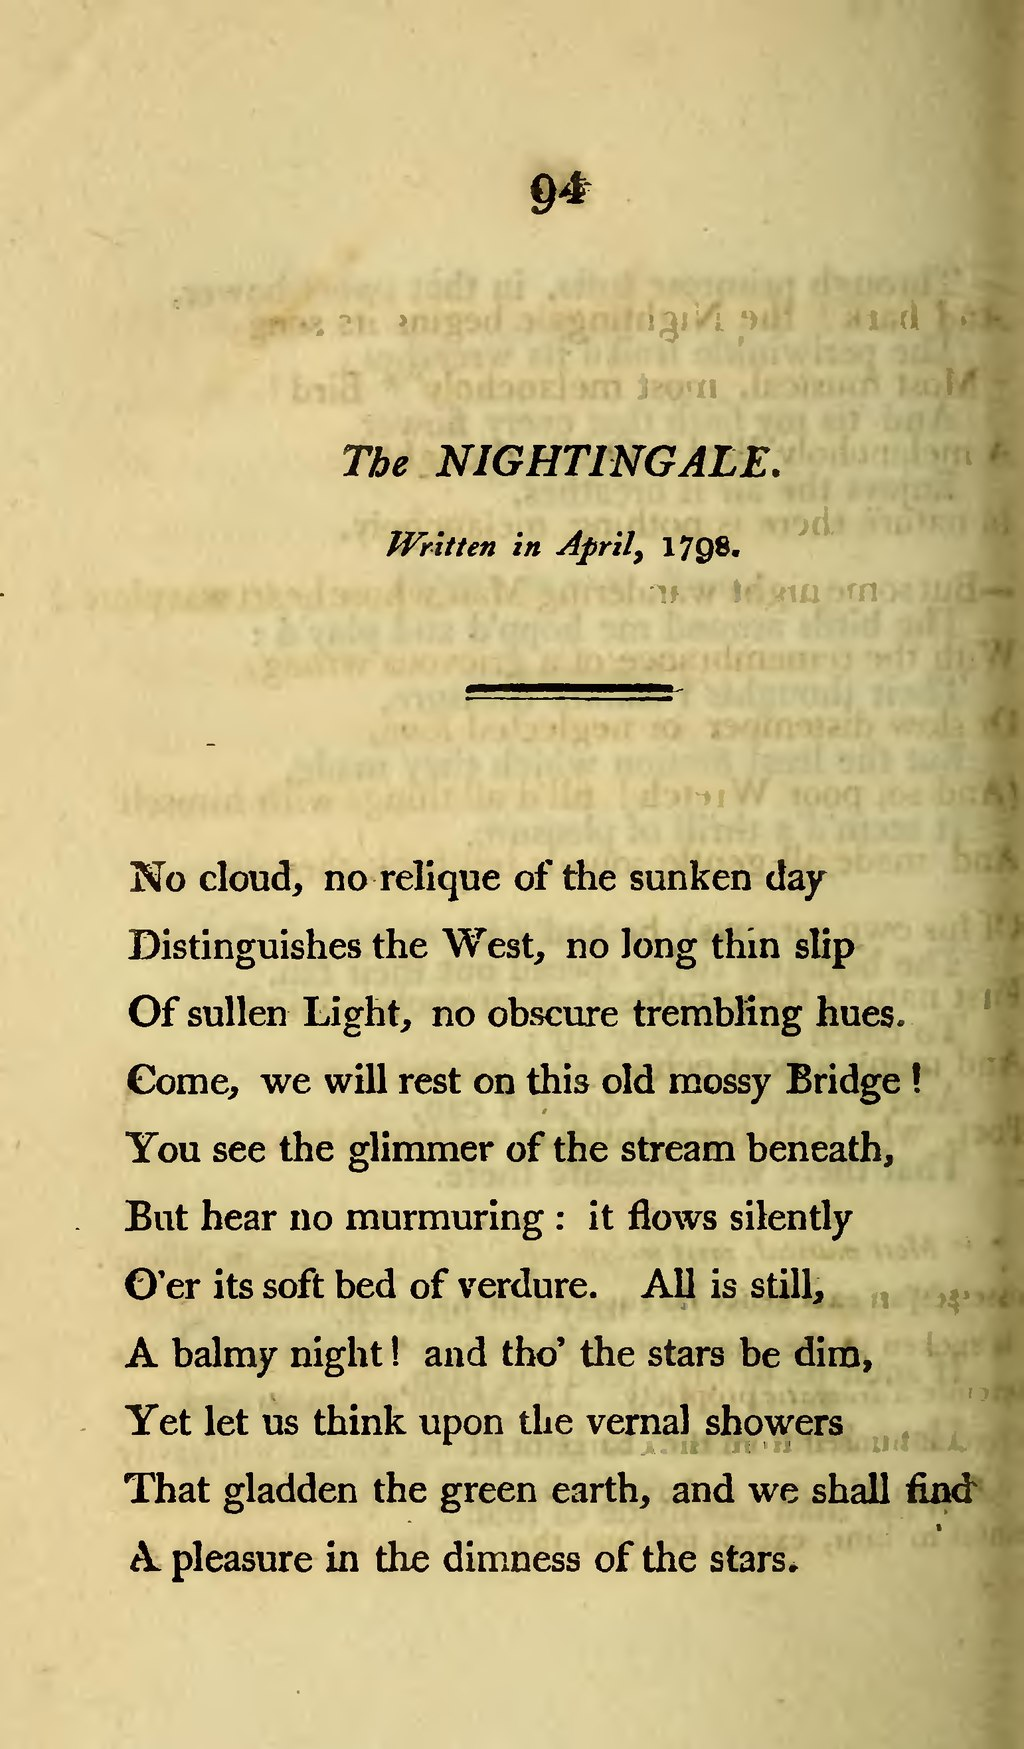 the nightingale wordsworth